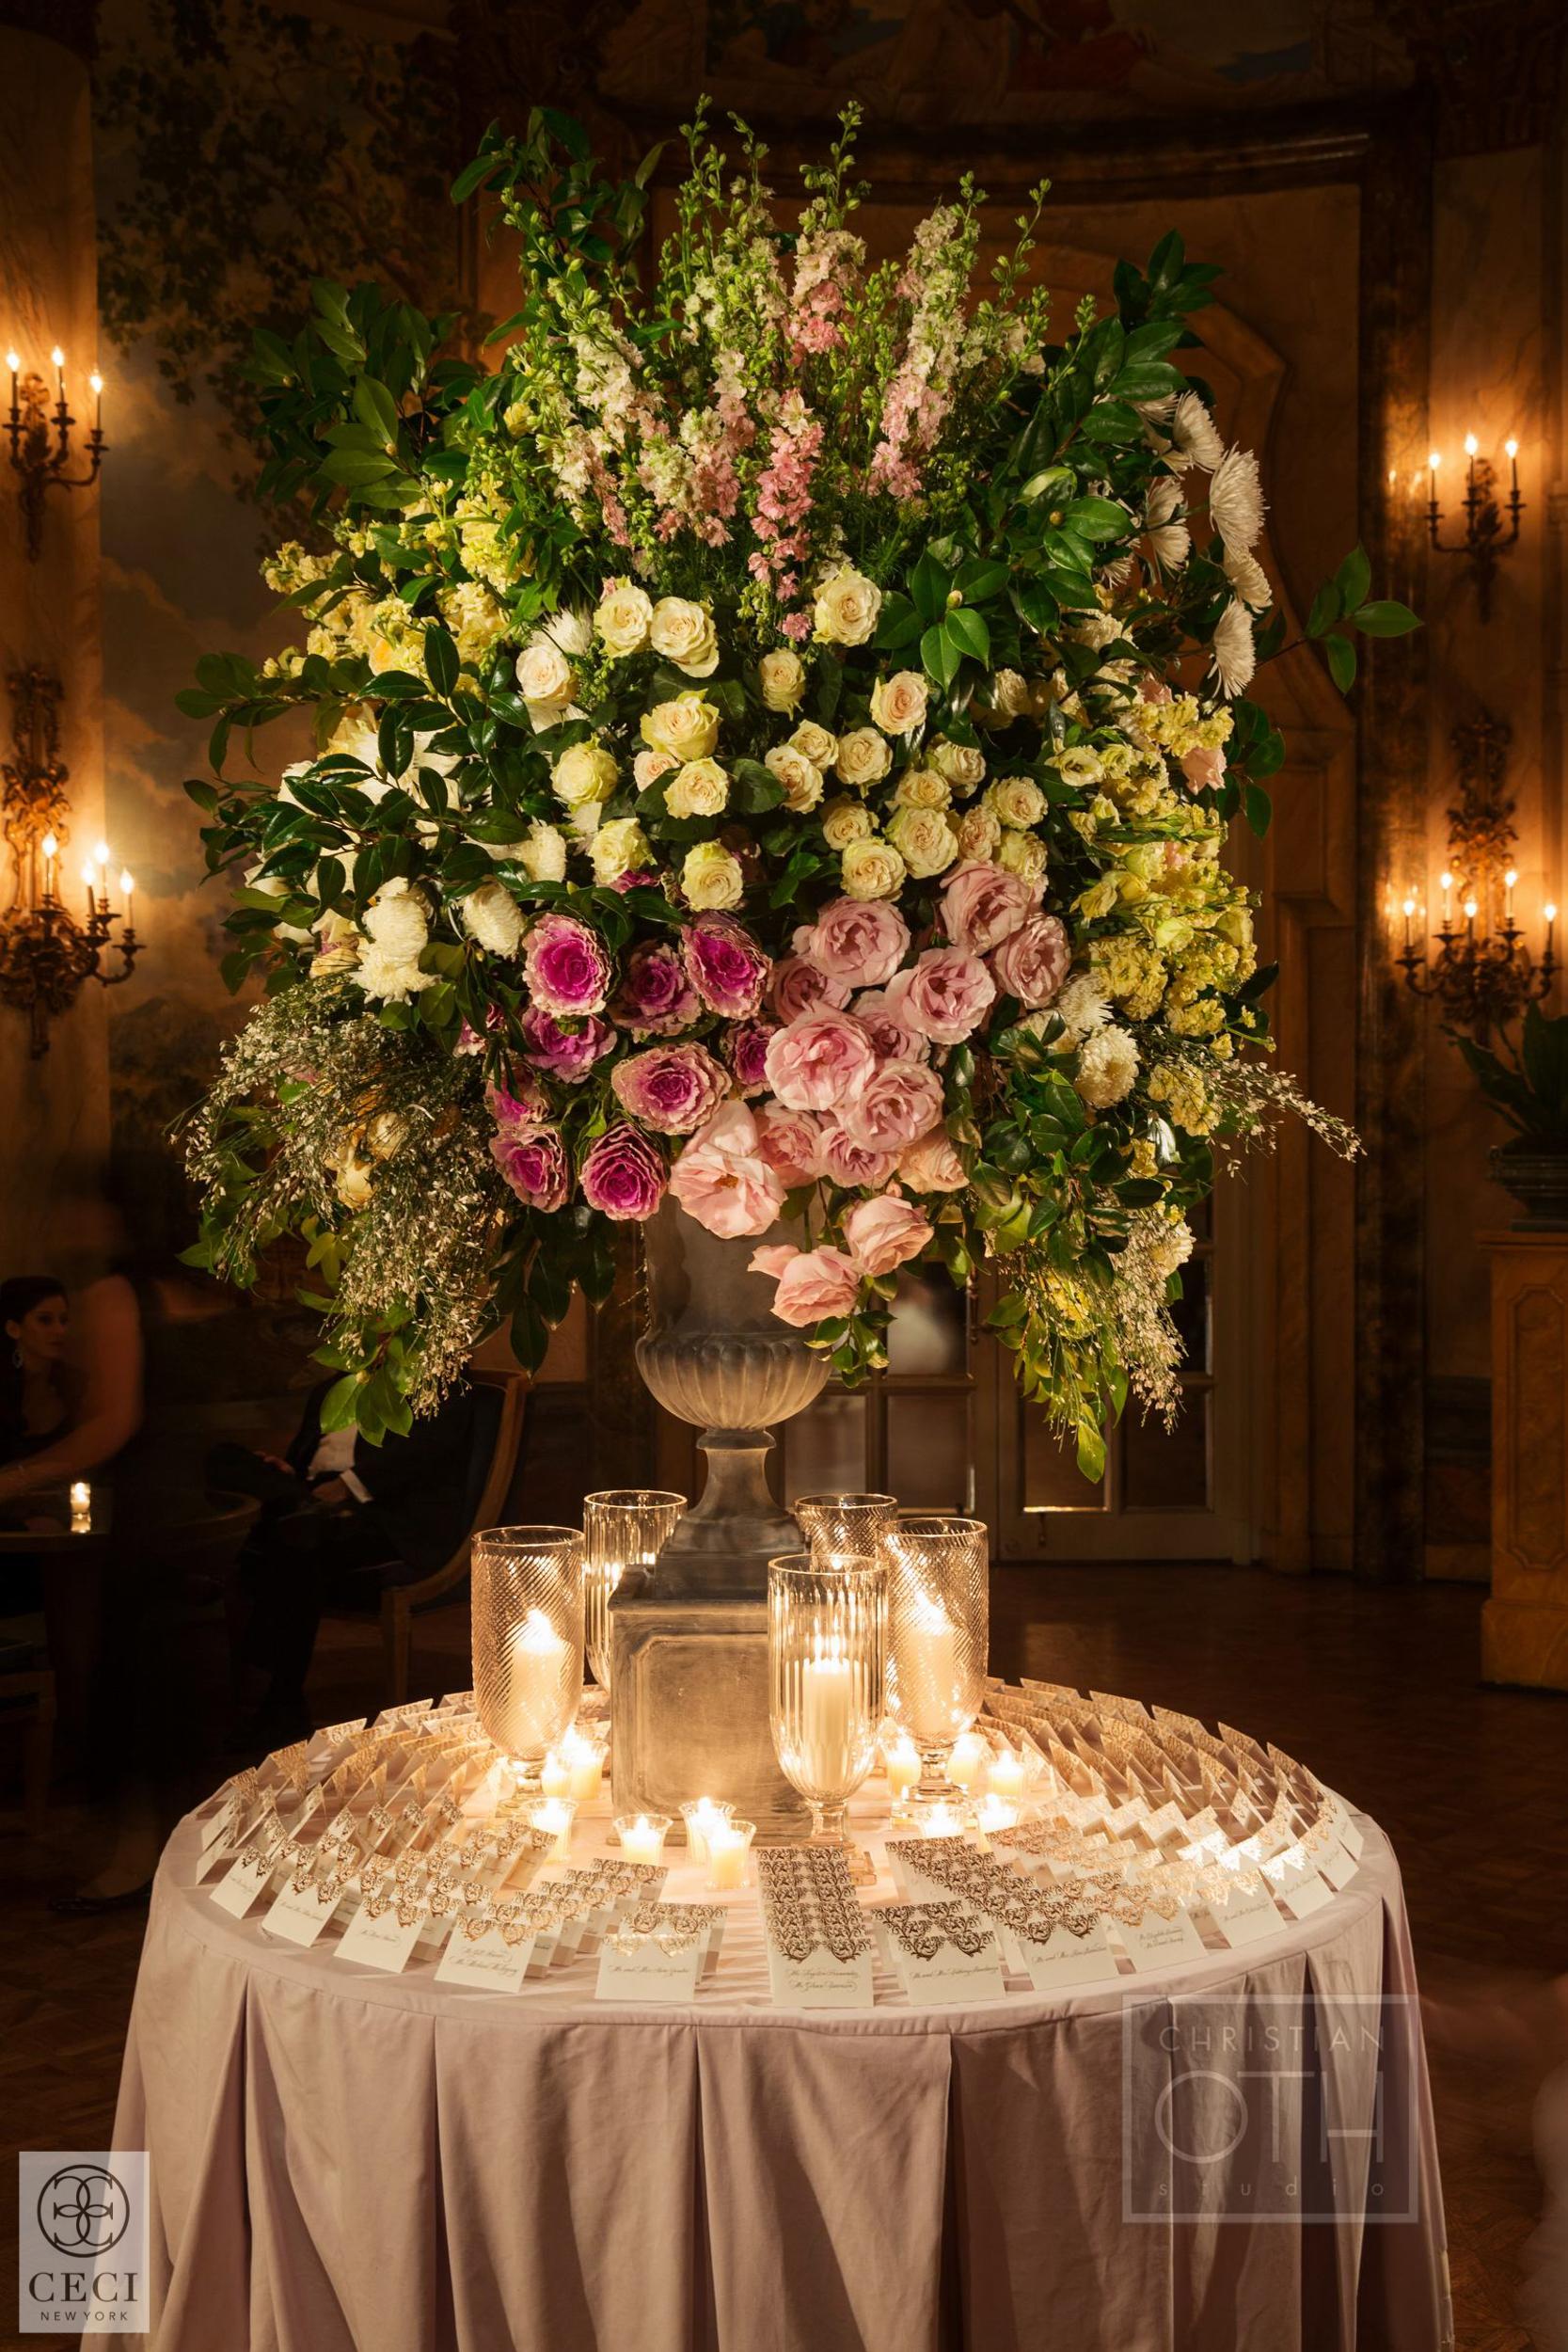 Ceci_New_York_Christian_Oth_CeciStyle_Pierre_New_York_City_Wedding_Luxury_Custom_Invitations_Personalized_Rose_Gold_Blush_Bride_-3.jpg